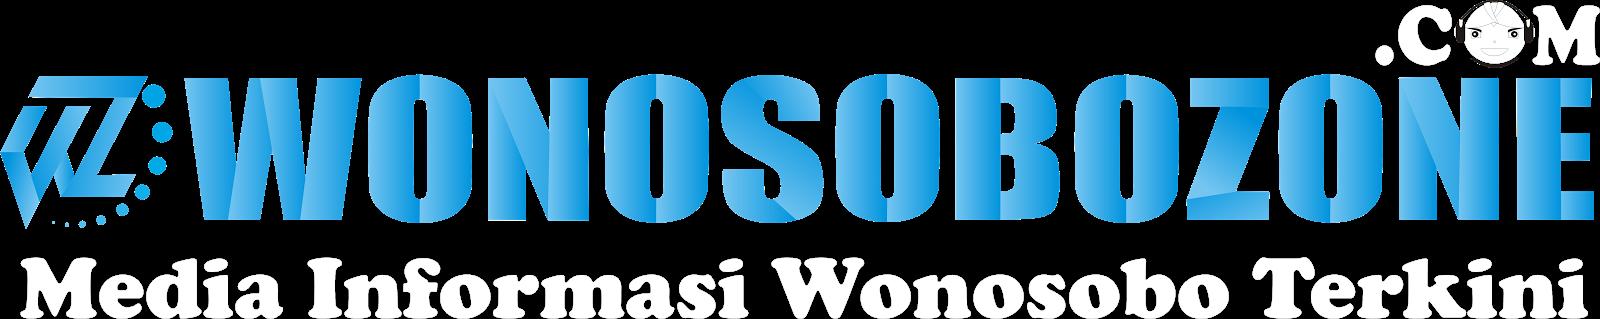 wonosobozone.com